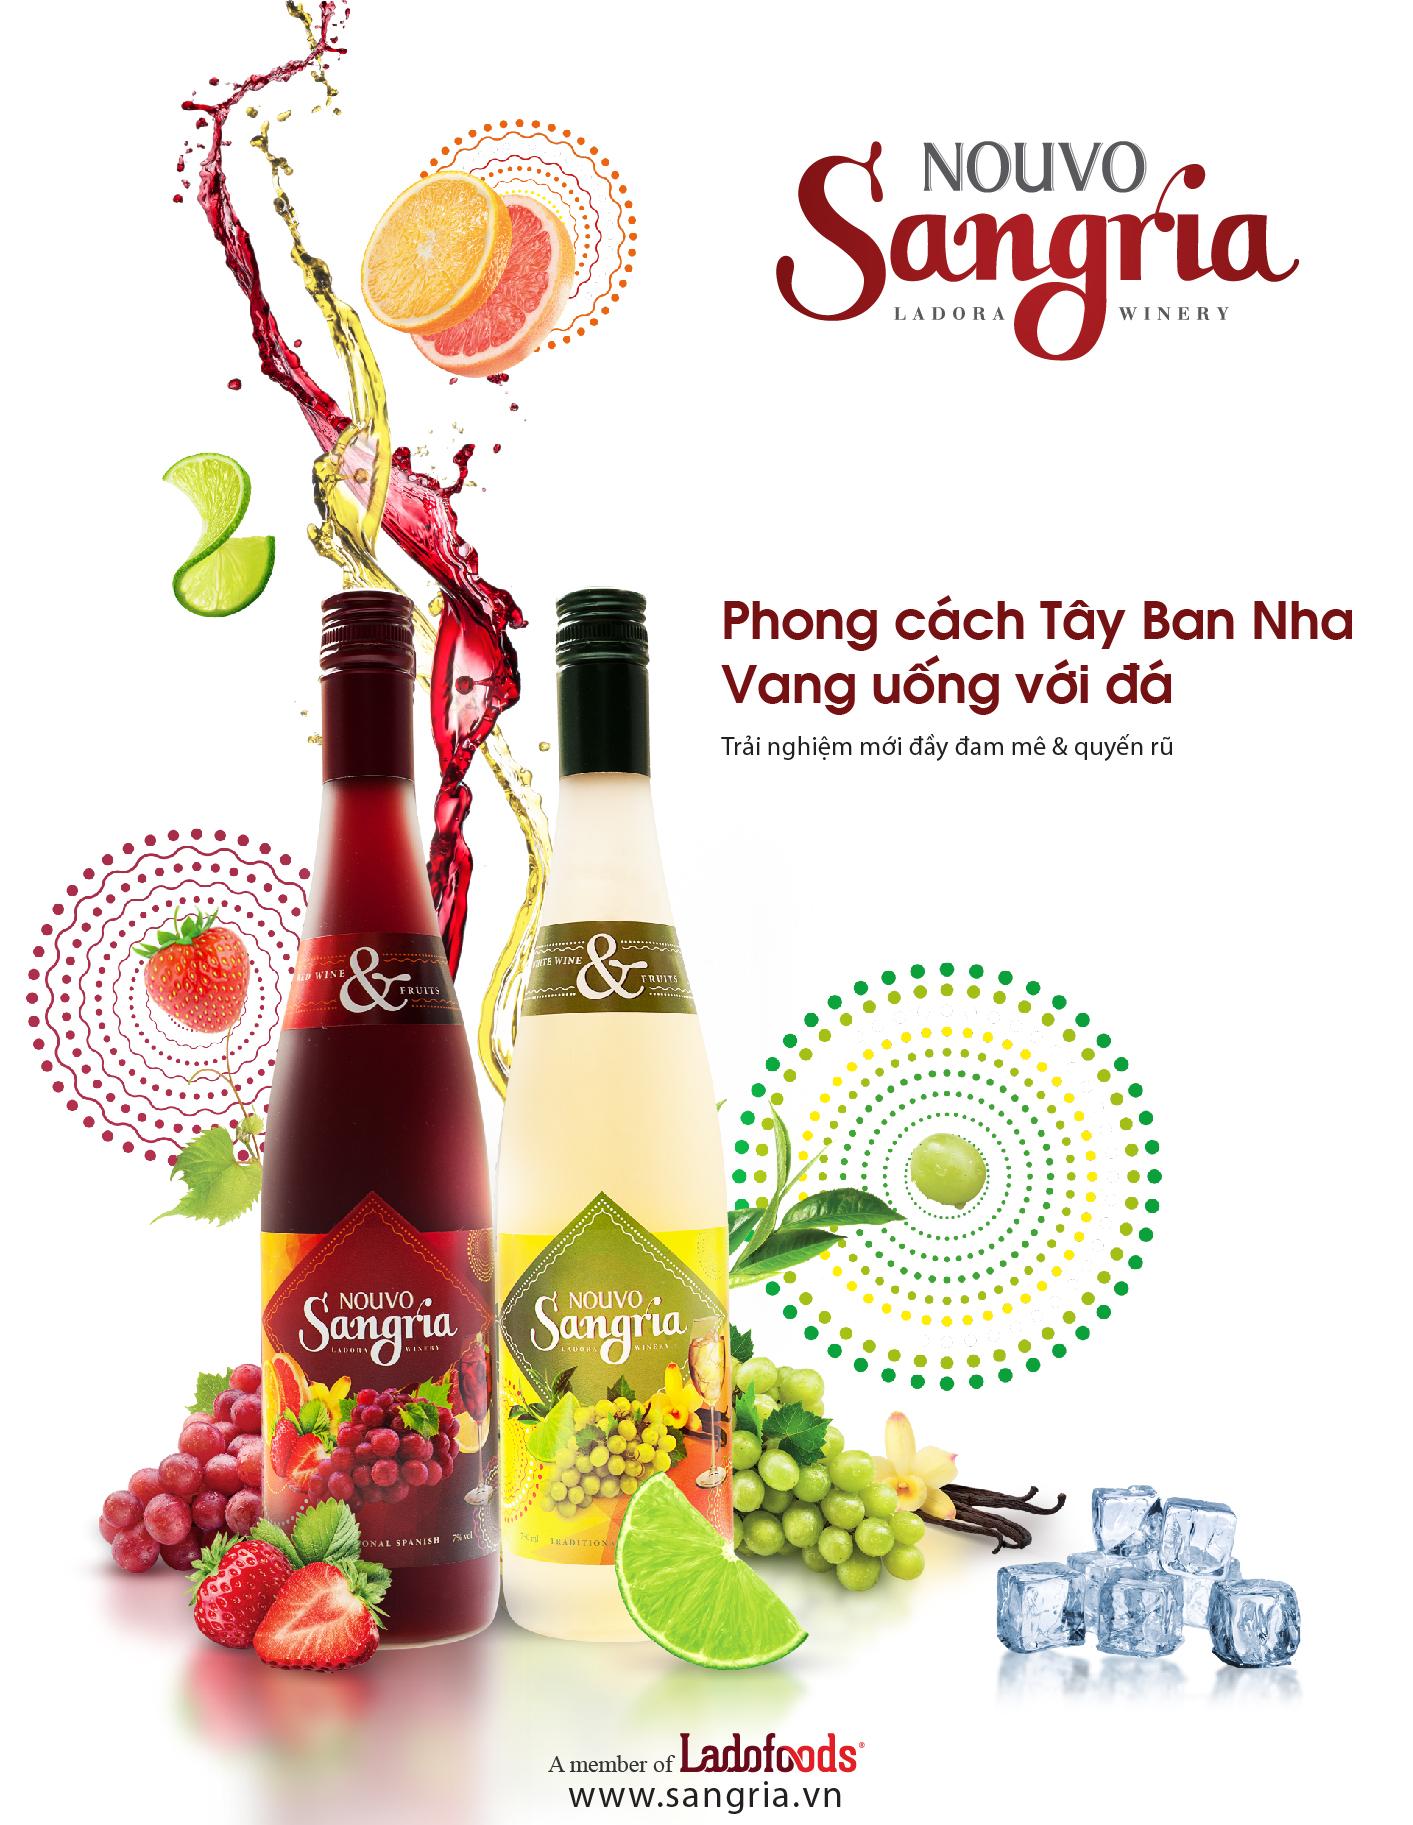 Banner Sitebar Sangria 339x438 px 02-01